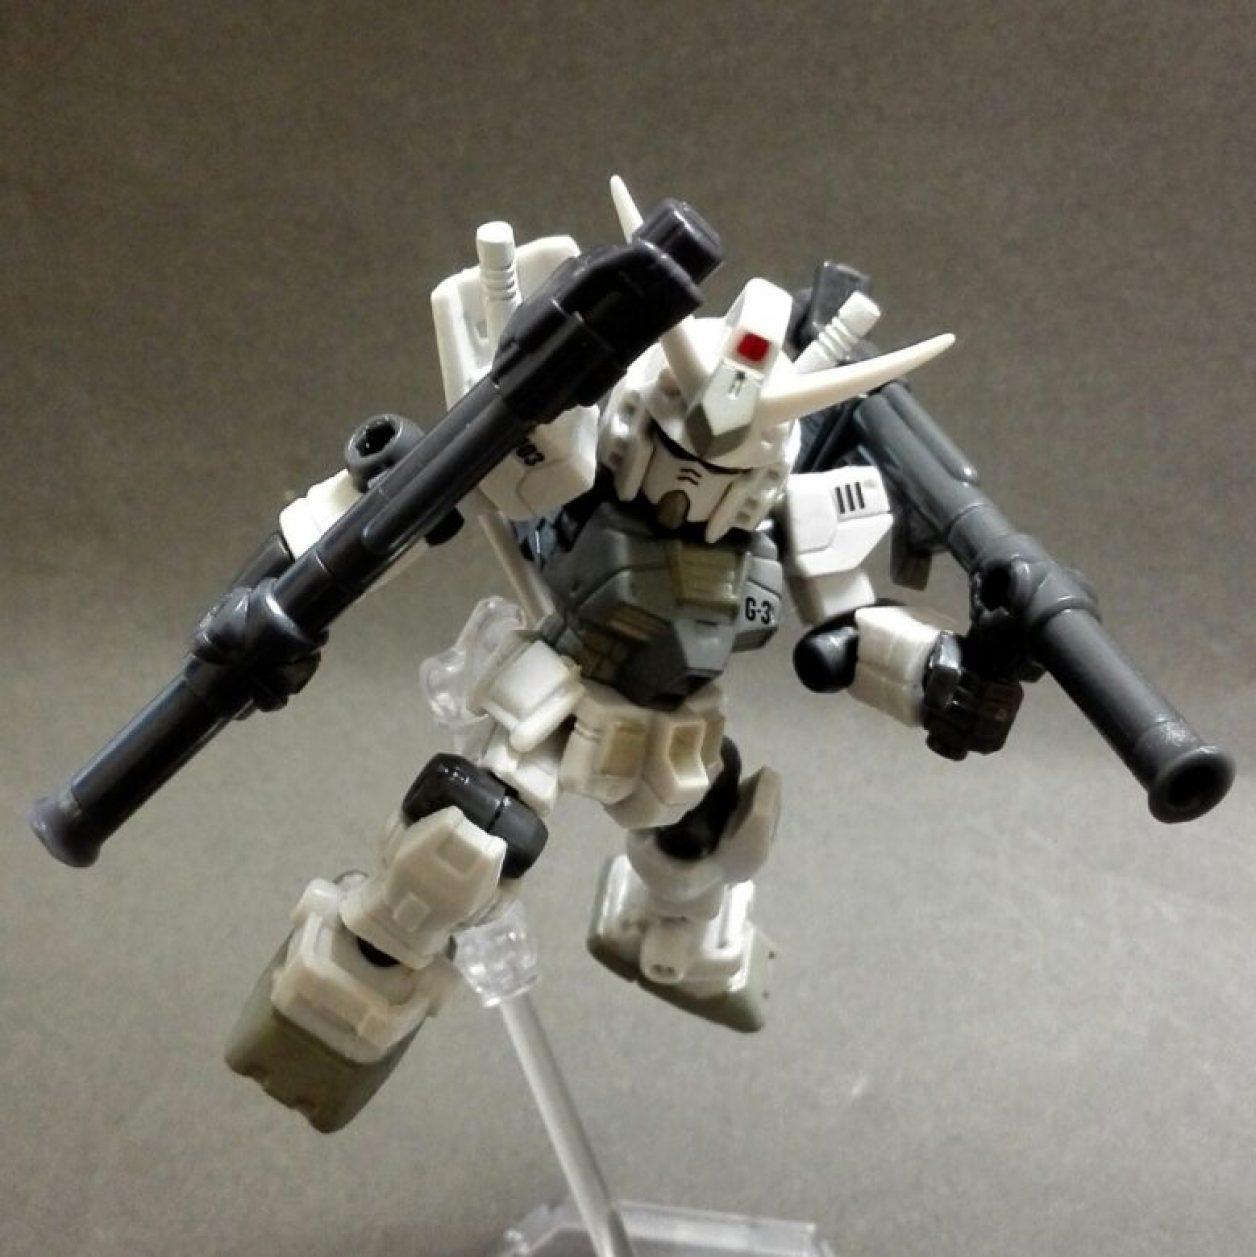 MOBILE SUIT ENSEMBLE(モビルスーツアンサンブル)1.5弾のガンダム(G3)と武器セットのハイパー・バズーカ組み合わせの画像